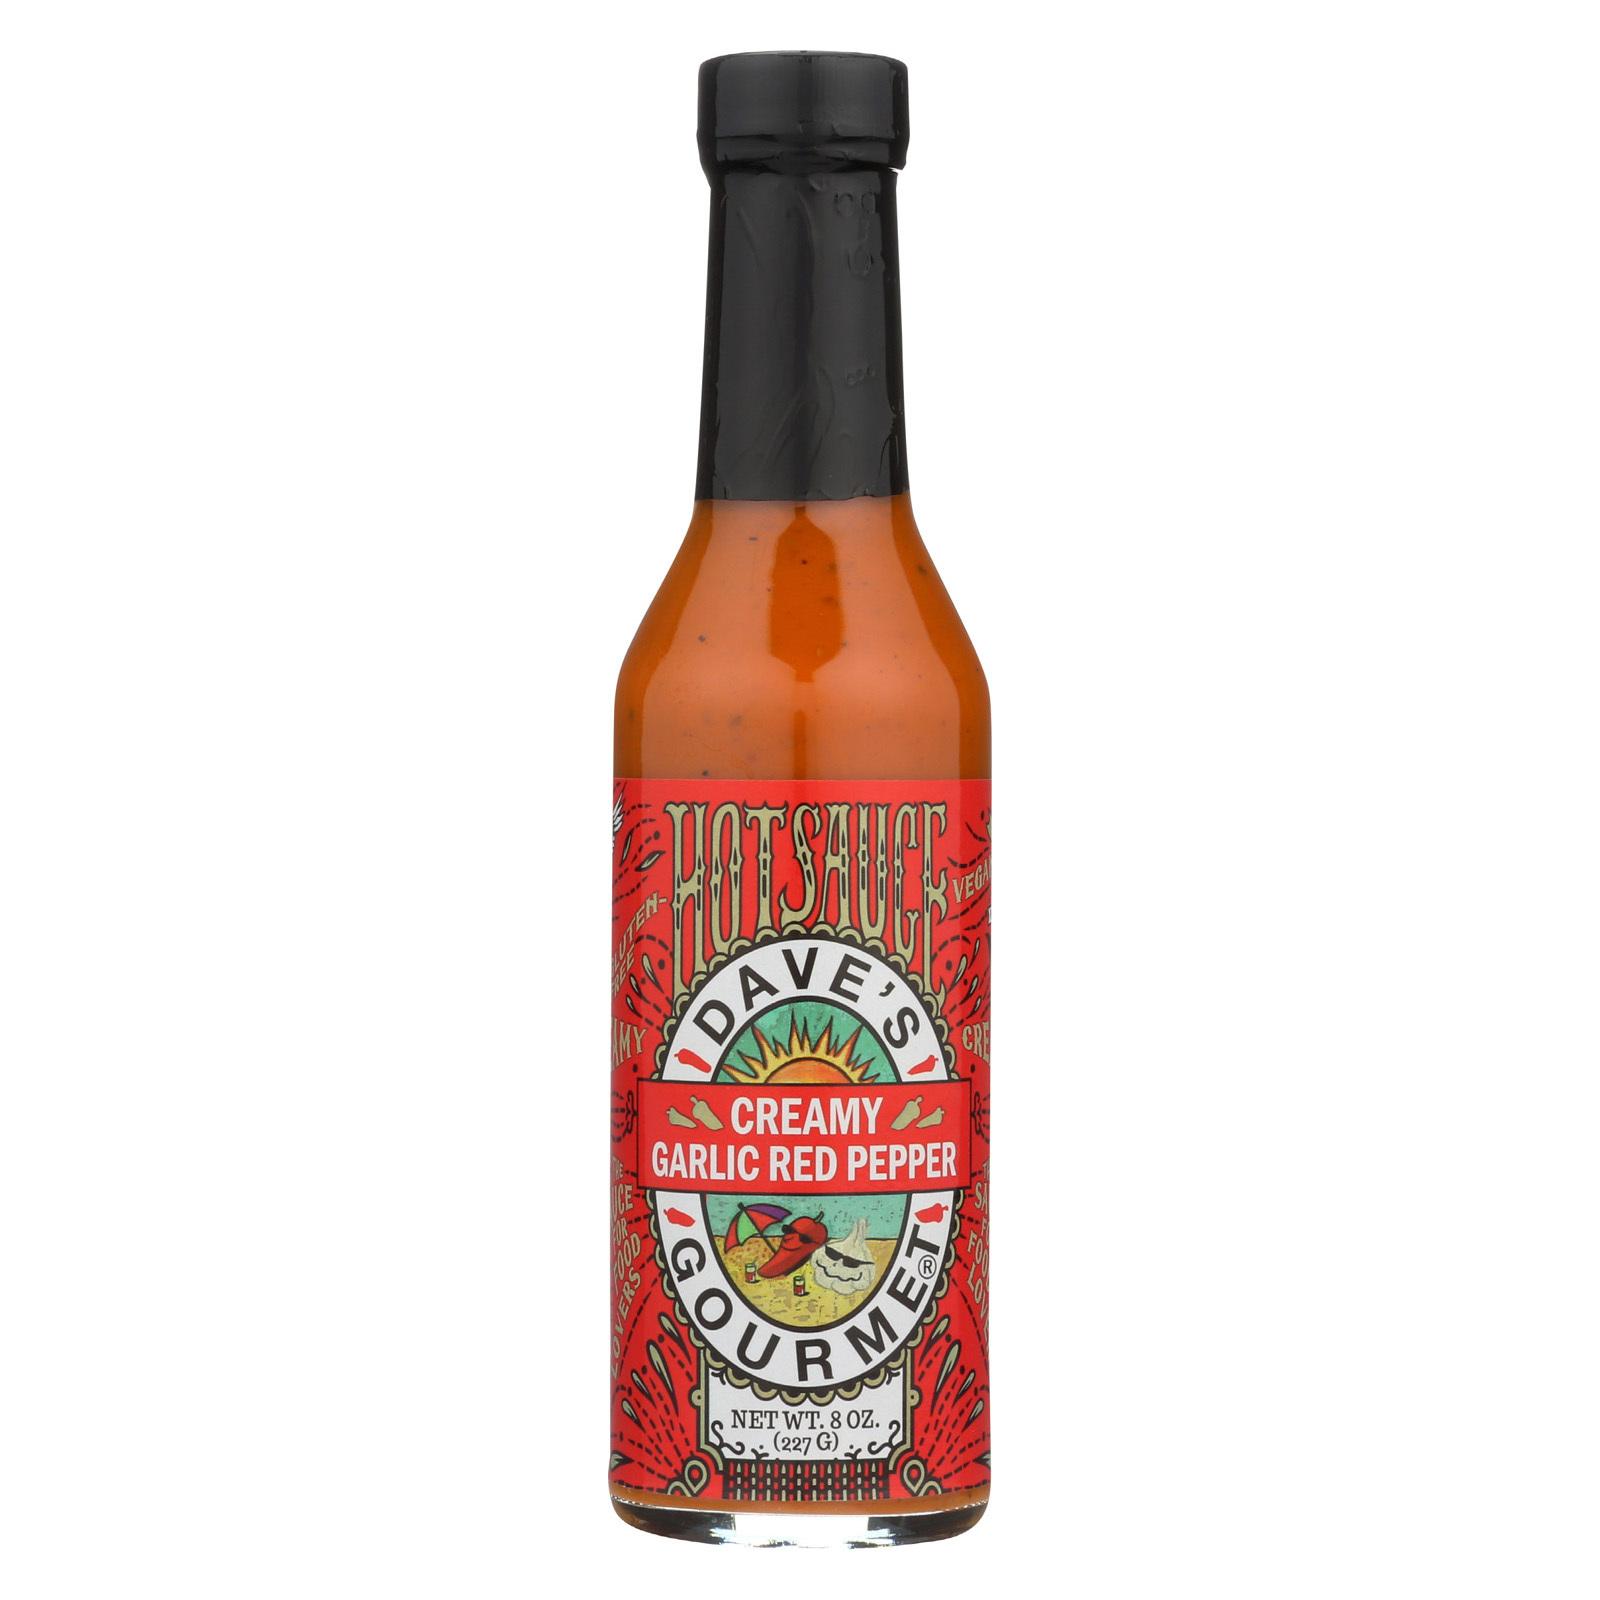 Dave's Gourmet Hot Sauce - Creamy Garlic Red Pepper - Case of 6 - 8 fl oz